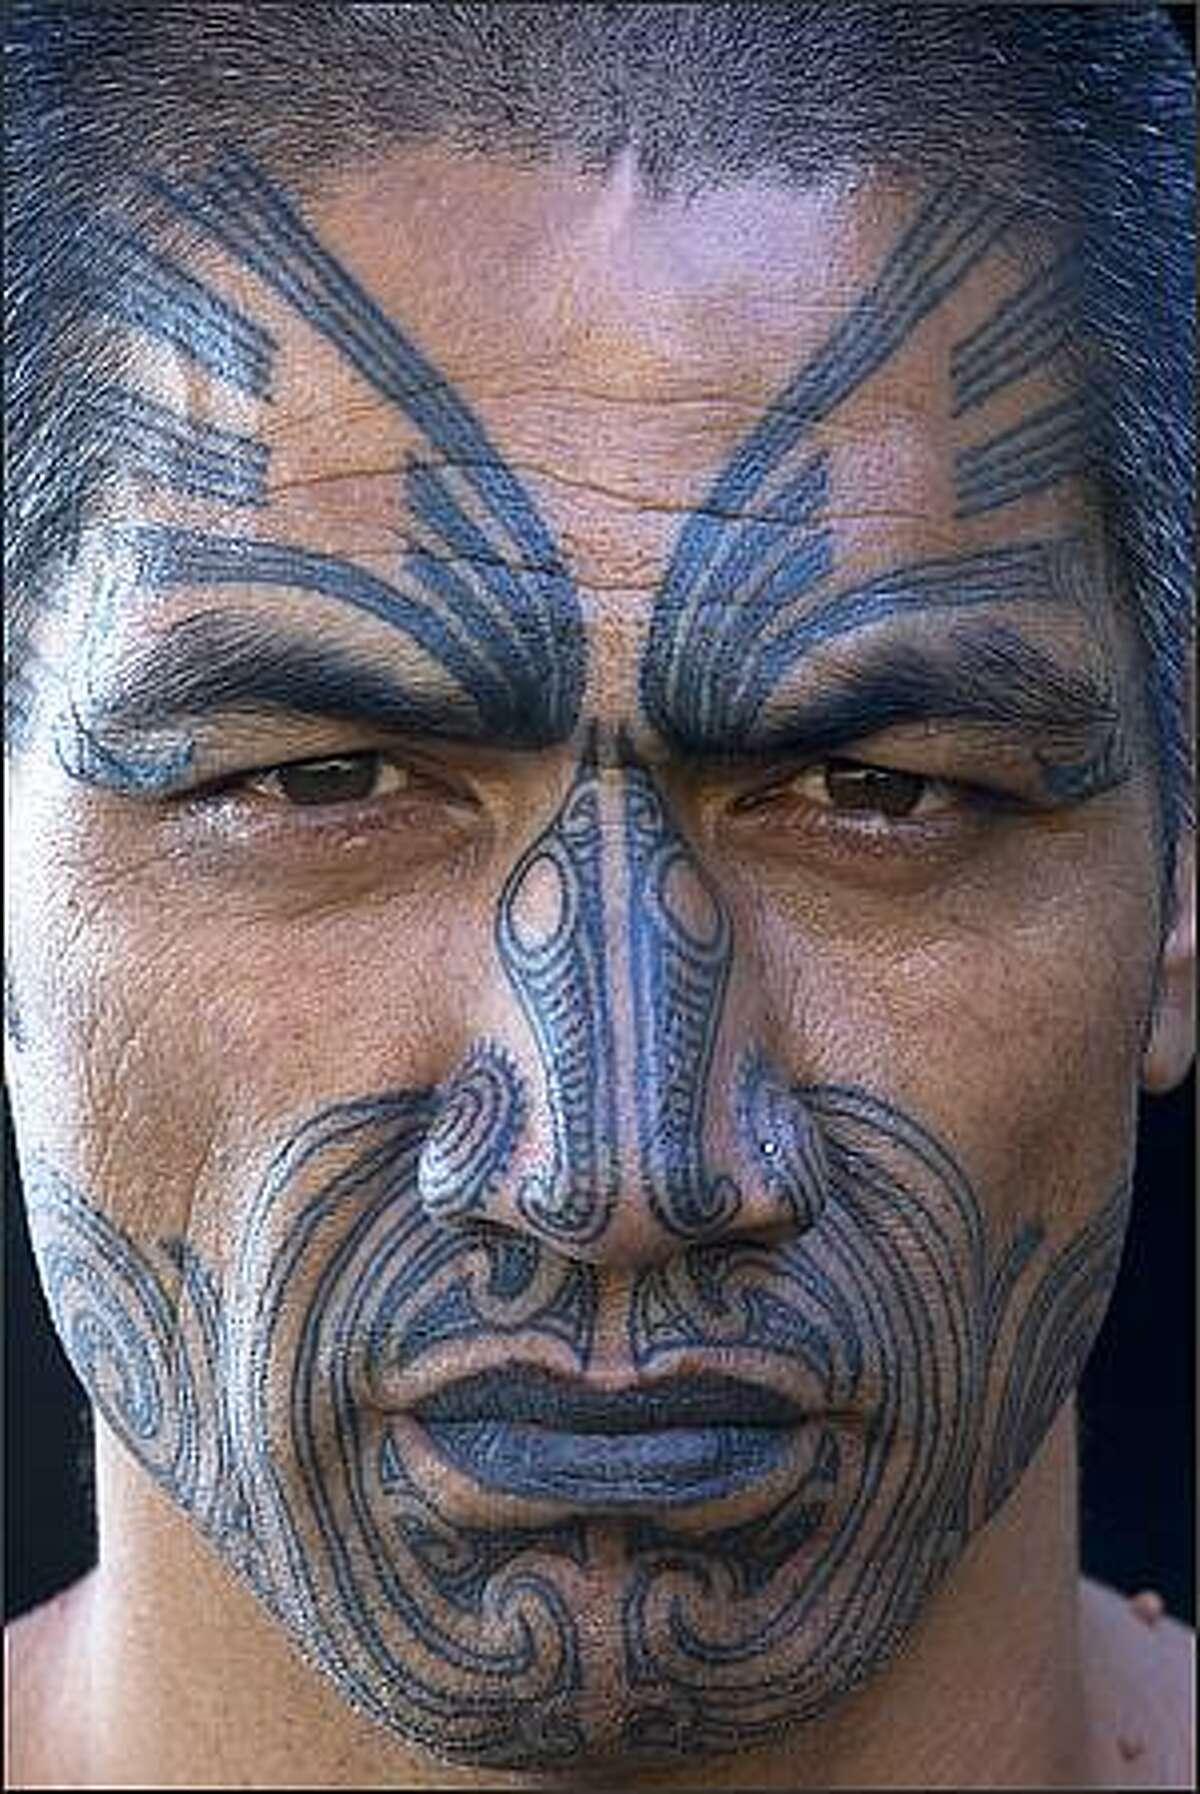 Maori dancers, New Zealand. Art Wolfe / Edge of the Earth Productions, LLC